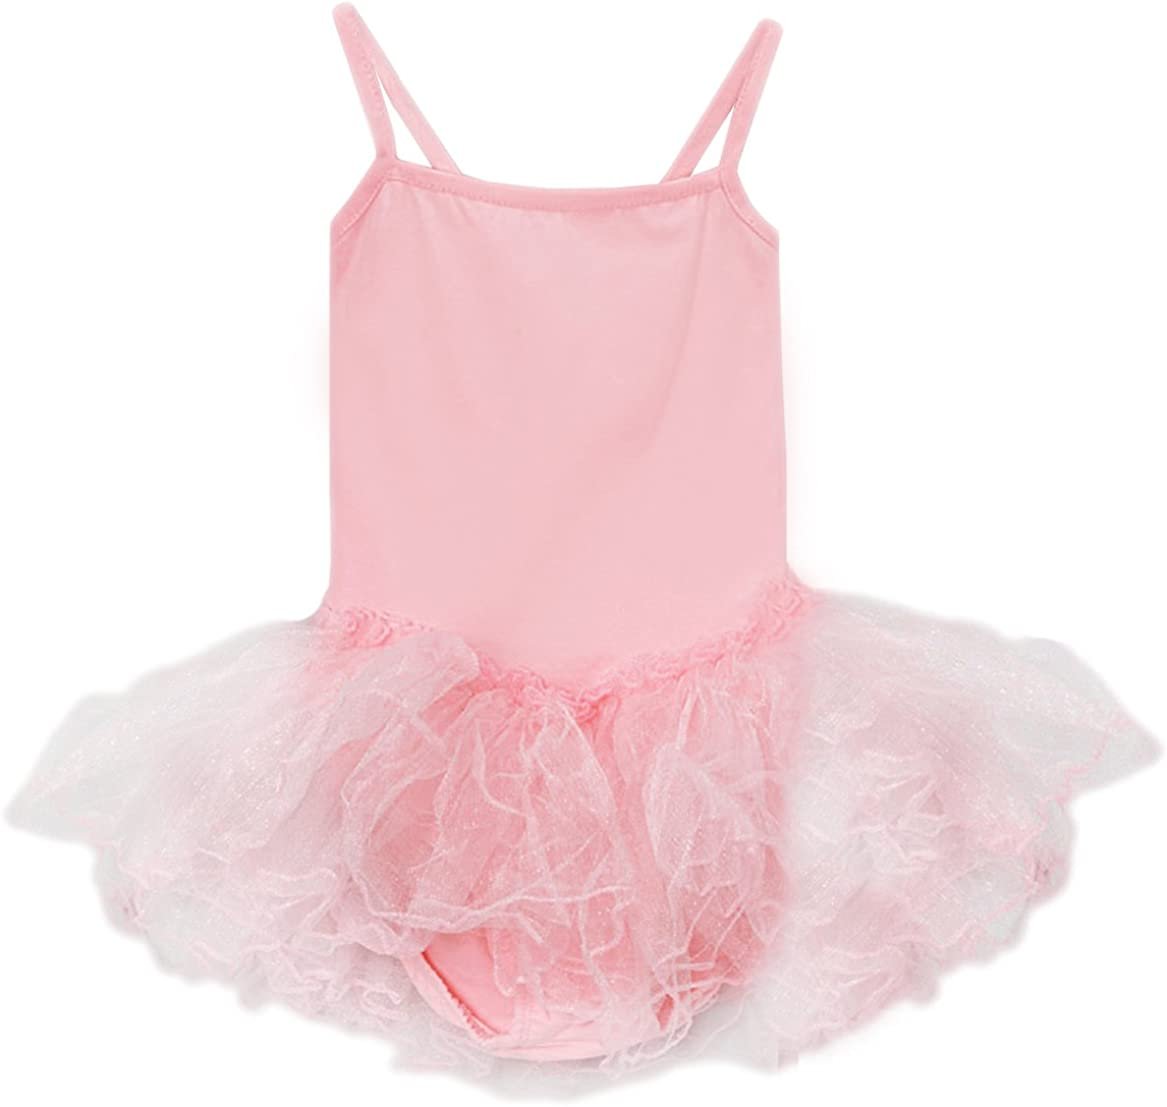 Princess Girls Camisole Tutu Dress in Pink, Lavender, Black, Hot Pink